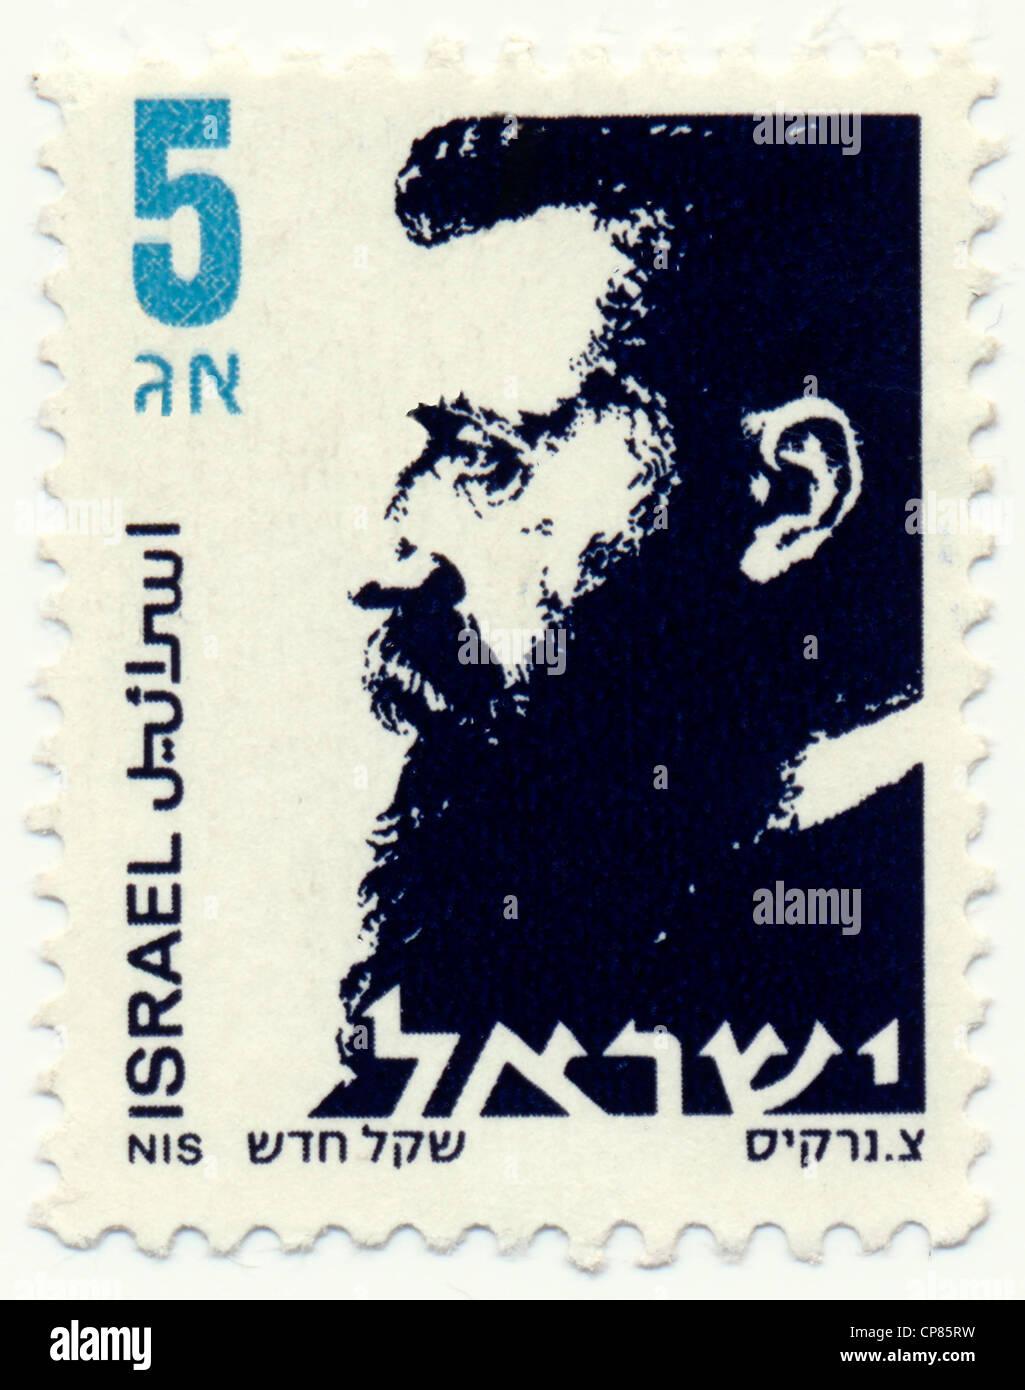 Historic postage stamps from Israel, Historische Briefmarken, Dr. Theodor Herzl, 1986, Israel, Asien - Stock Image